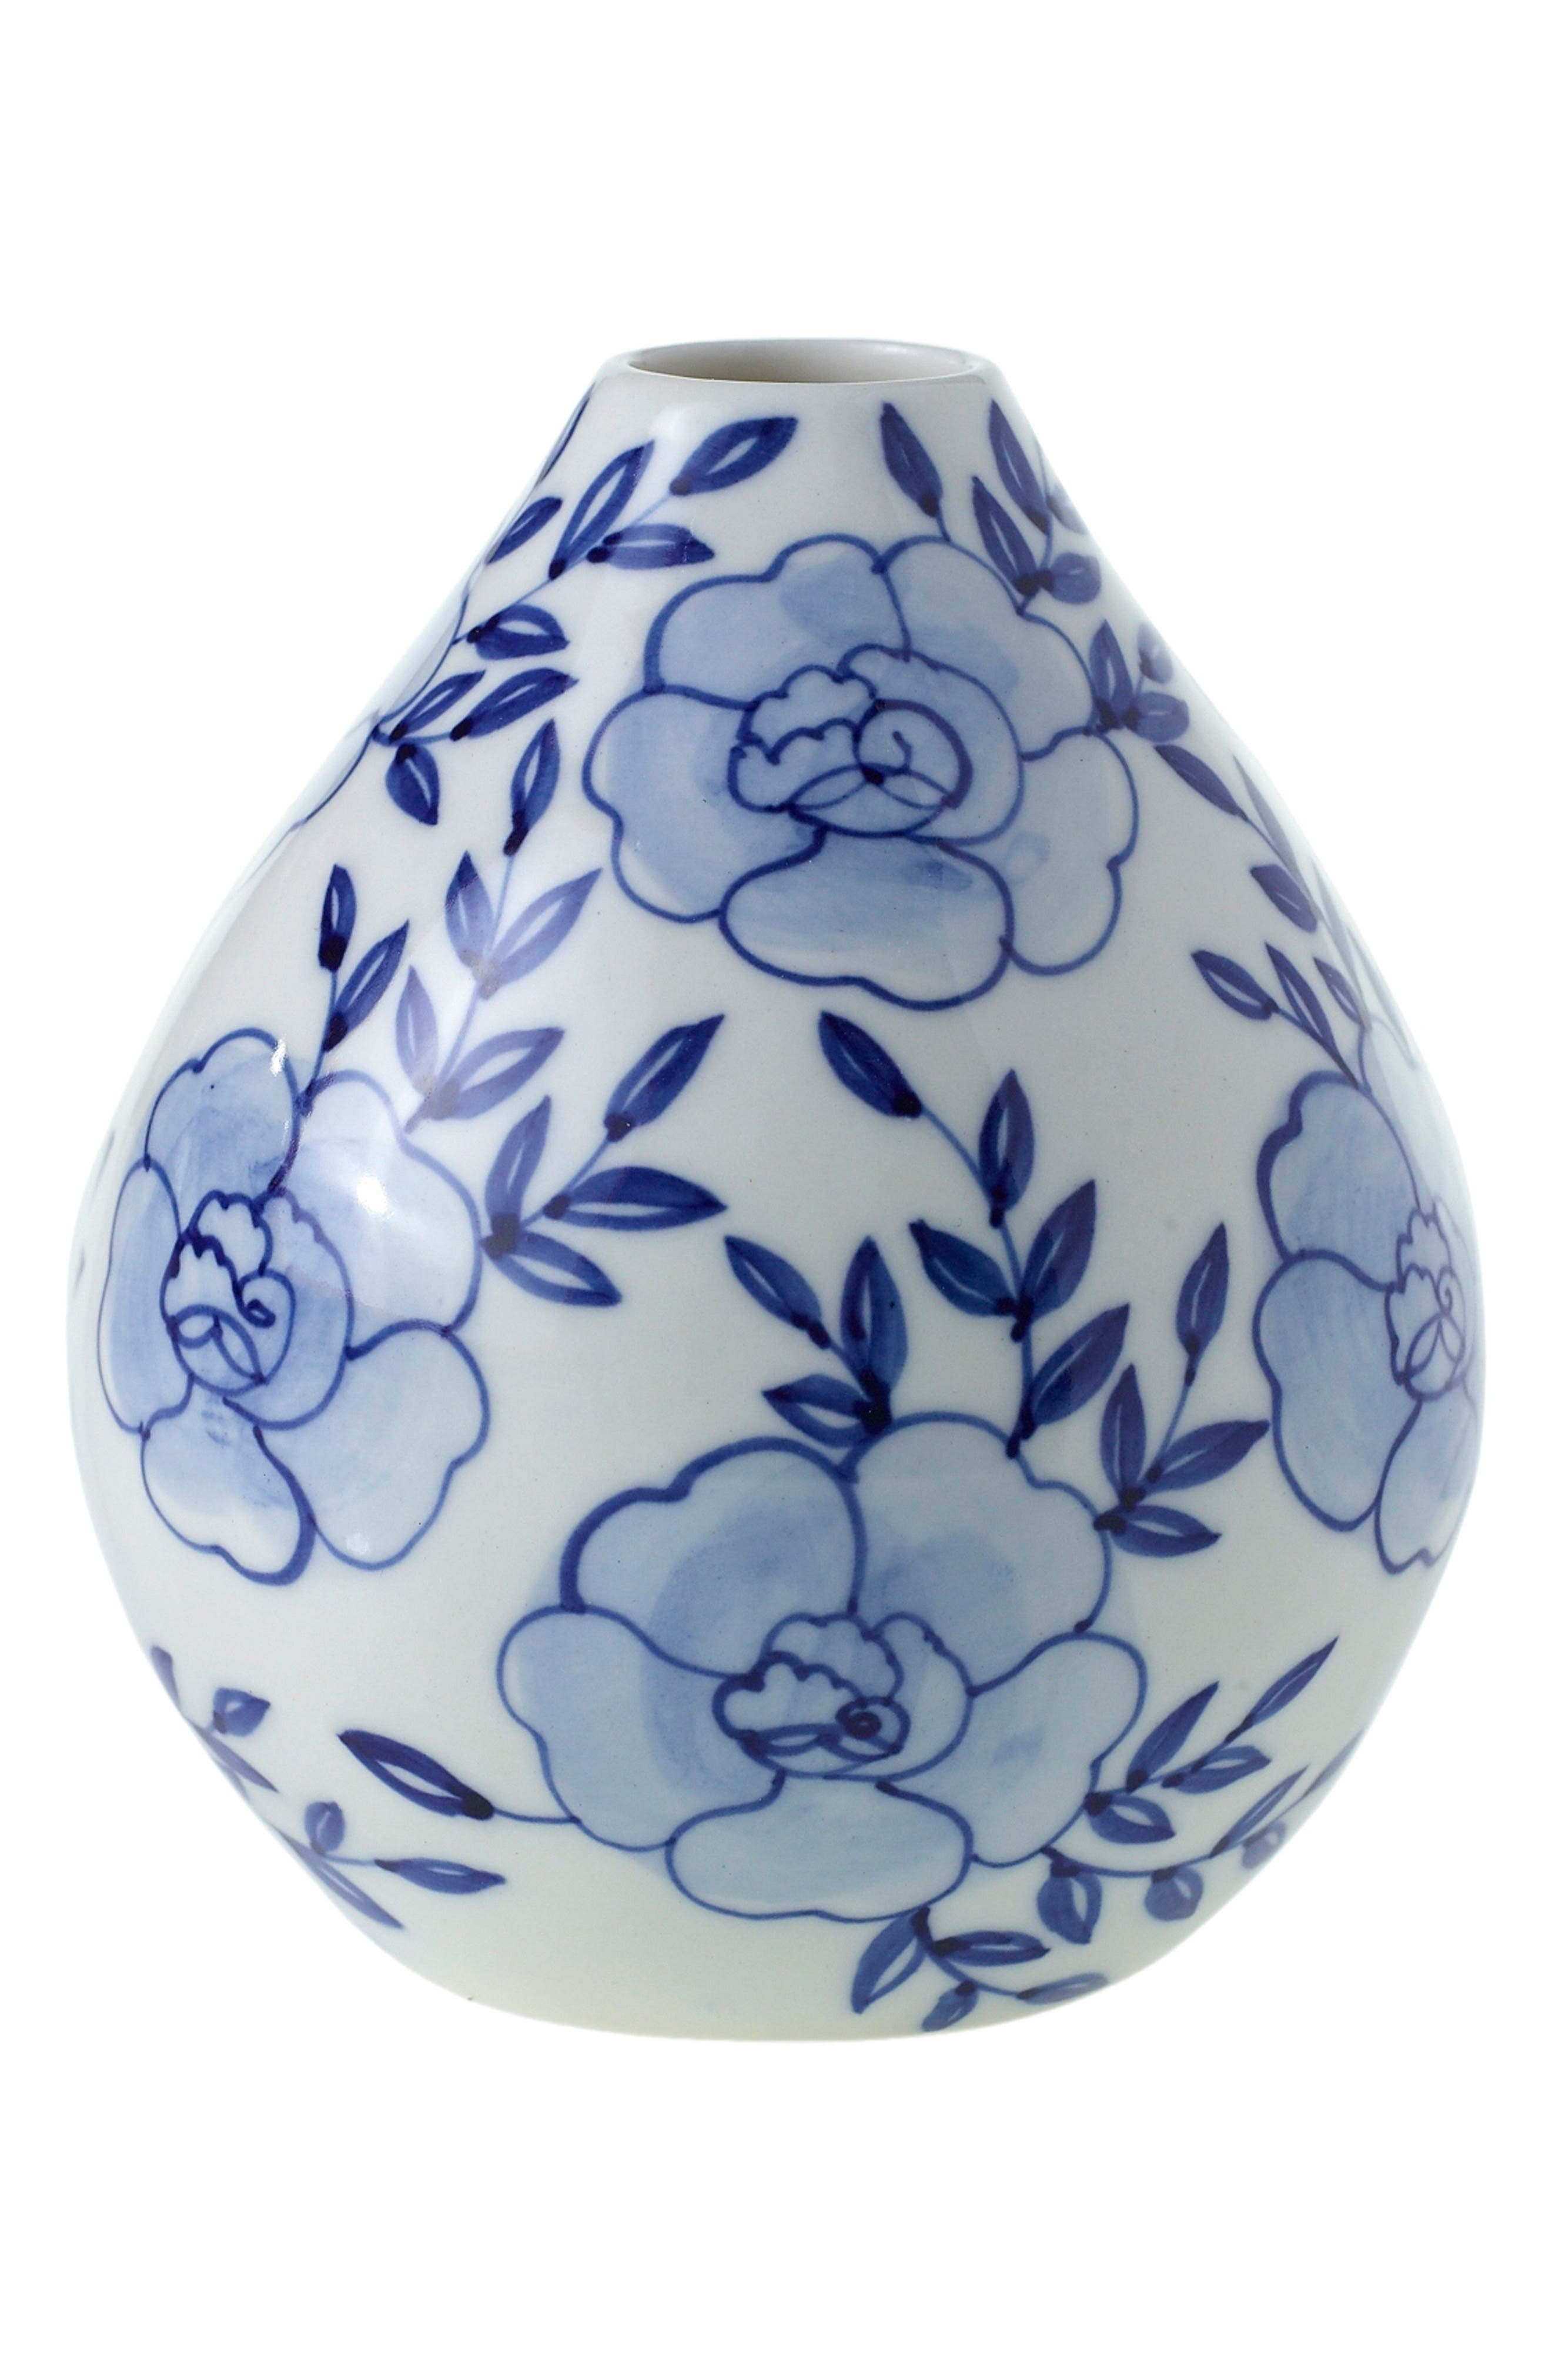 Eleanor Hand Painted Ceramic Bud Vase,                             Main thumbnail 1, color,